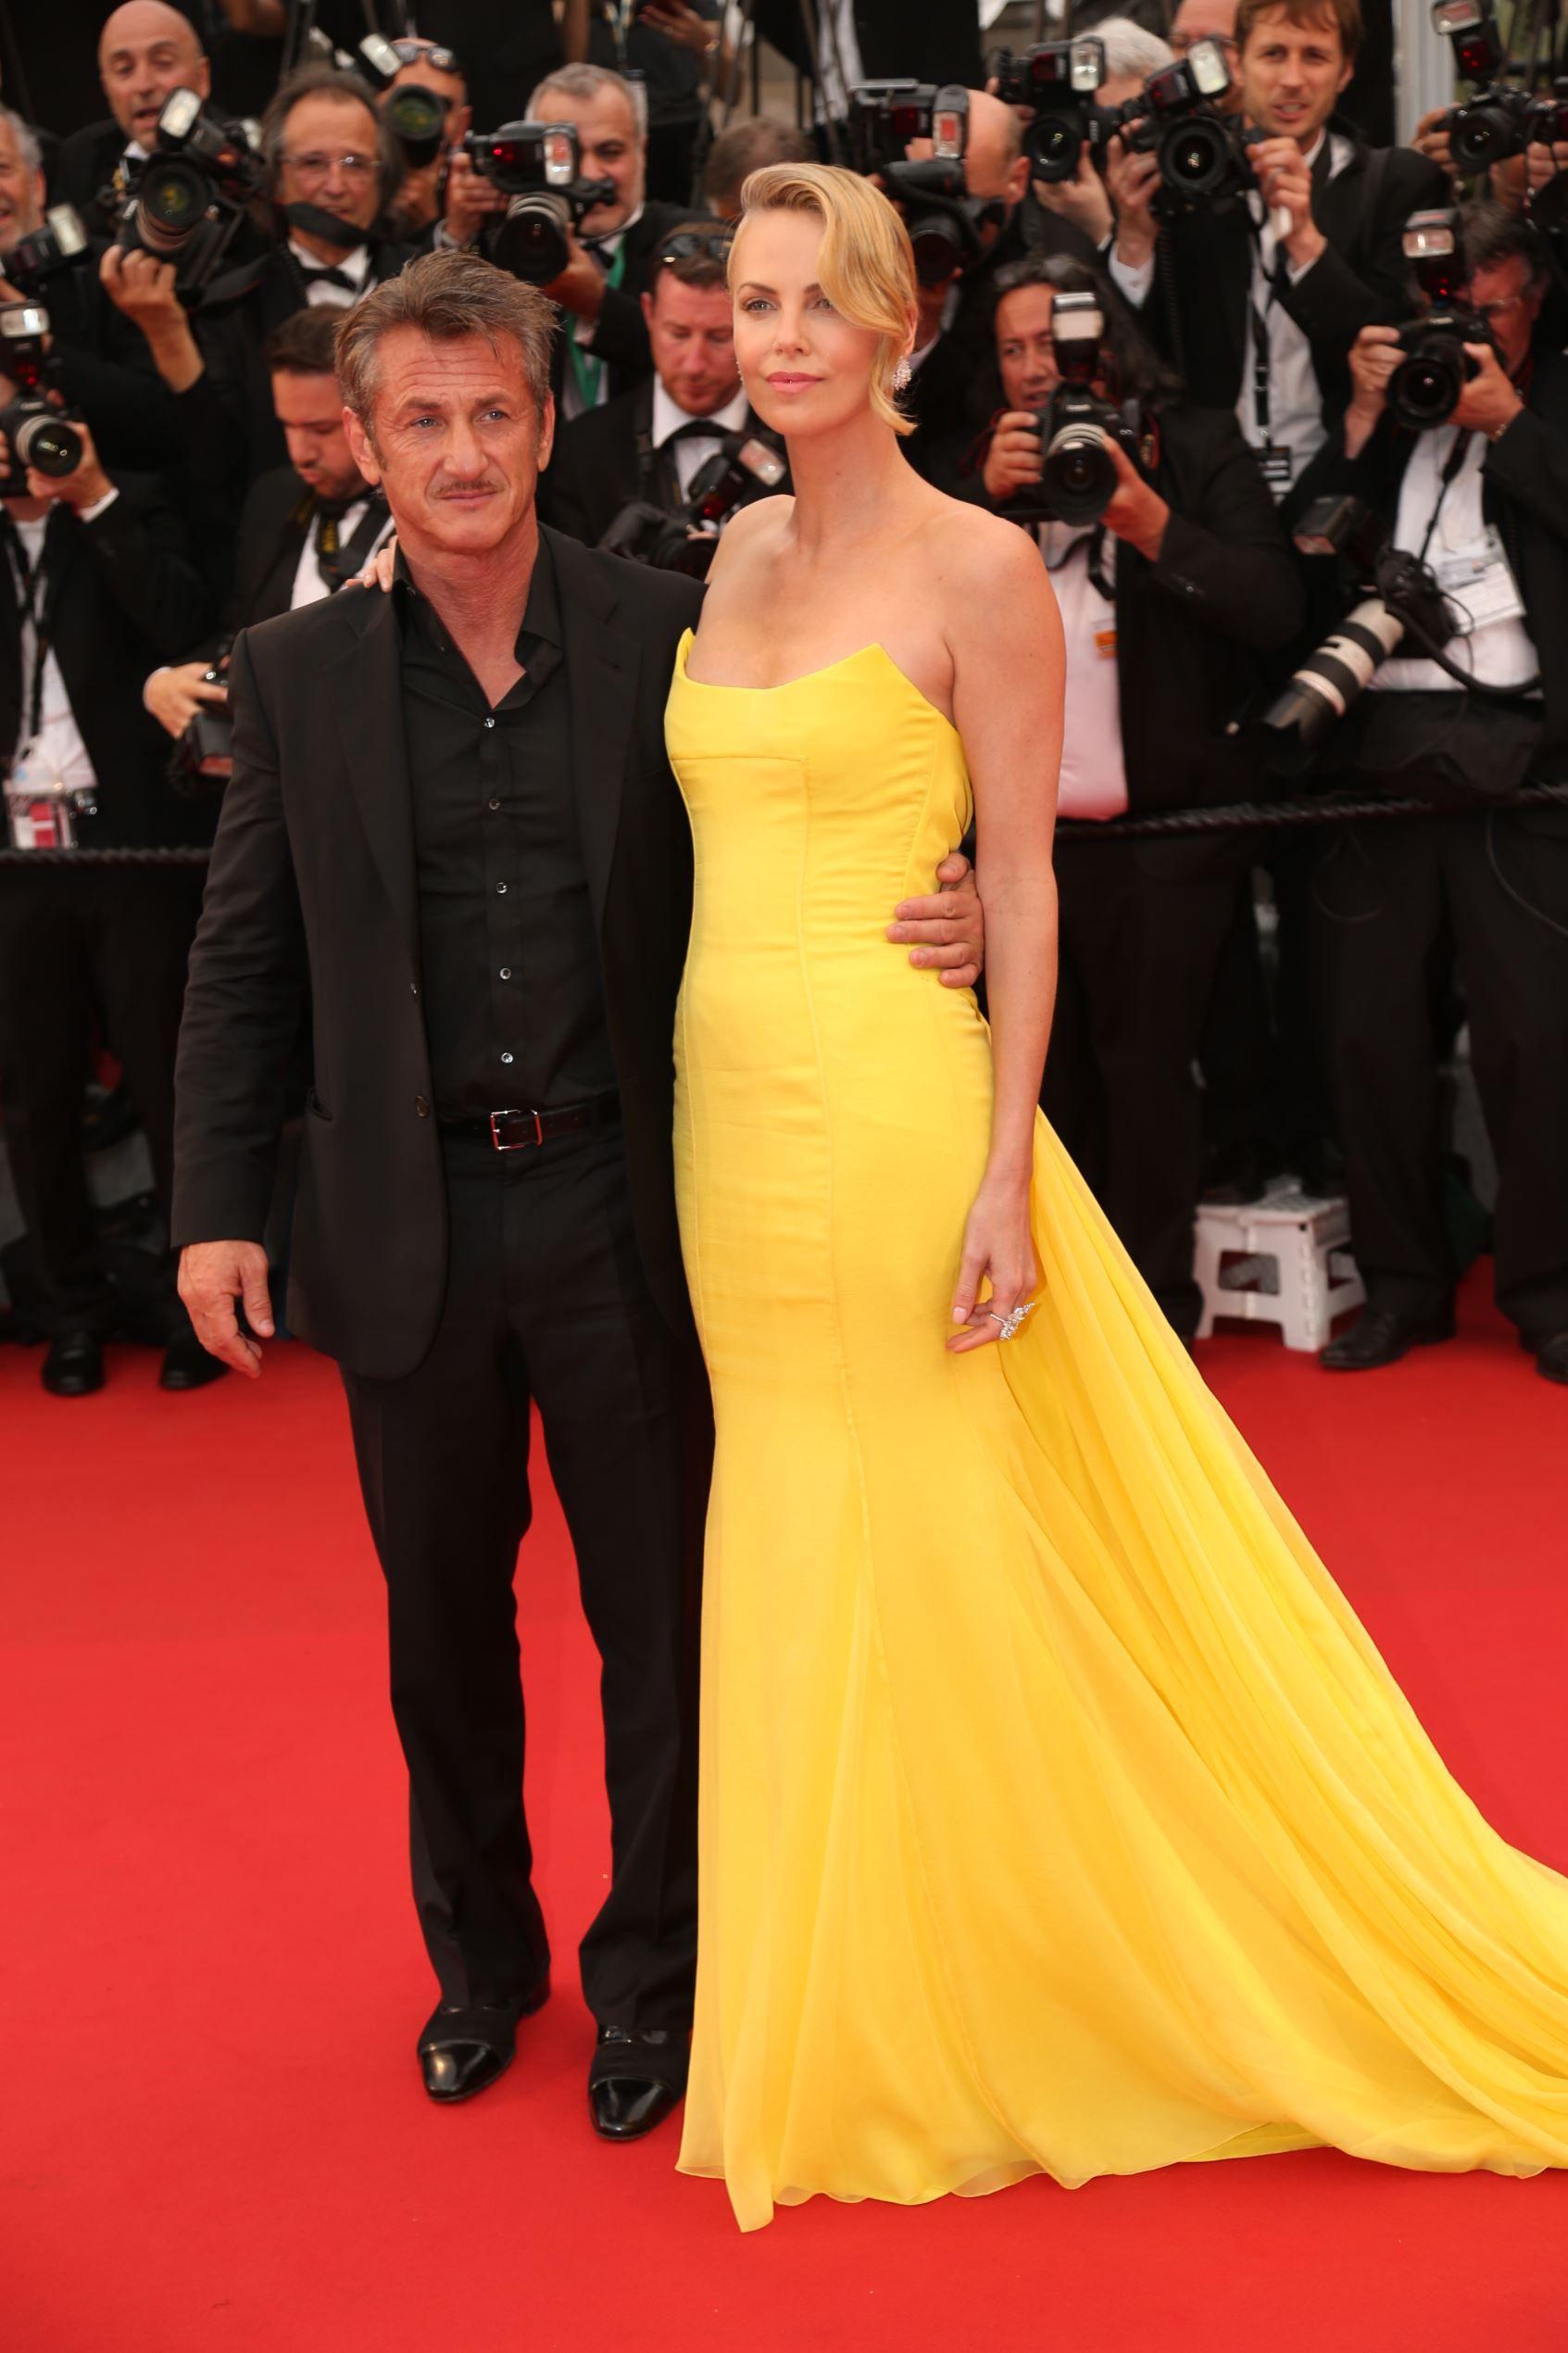 2015 Cannes Film Festival ~ Sean Penn and Charlize Theron at the 68th Cannes Film Festival in France ~ 5/14/2015.